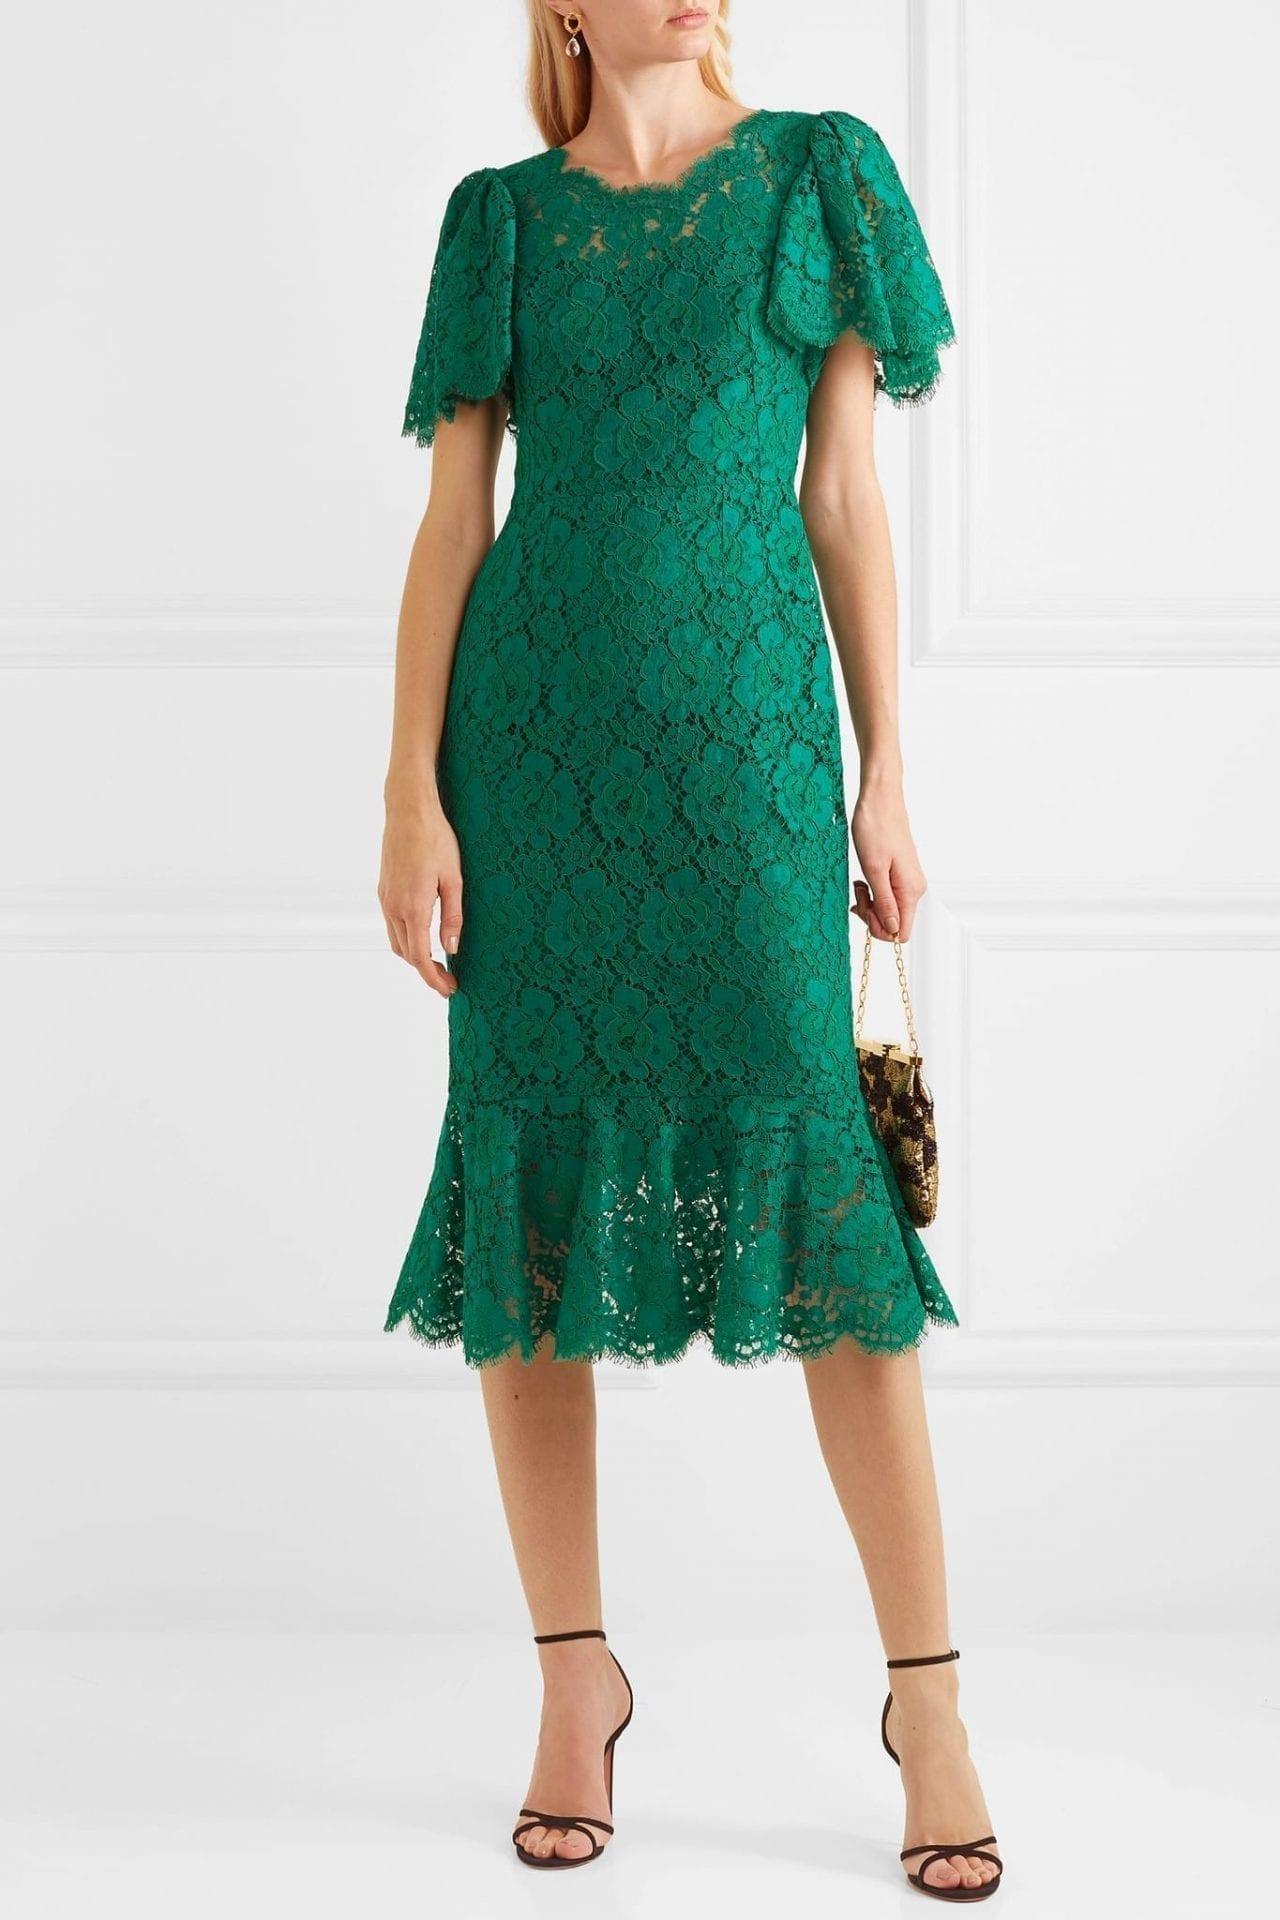 DOLCE & GABBANA Ruffled Corded Lace Midi Dress